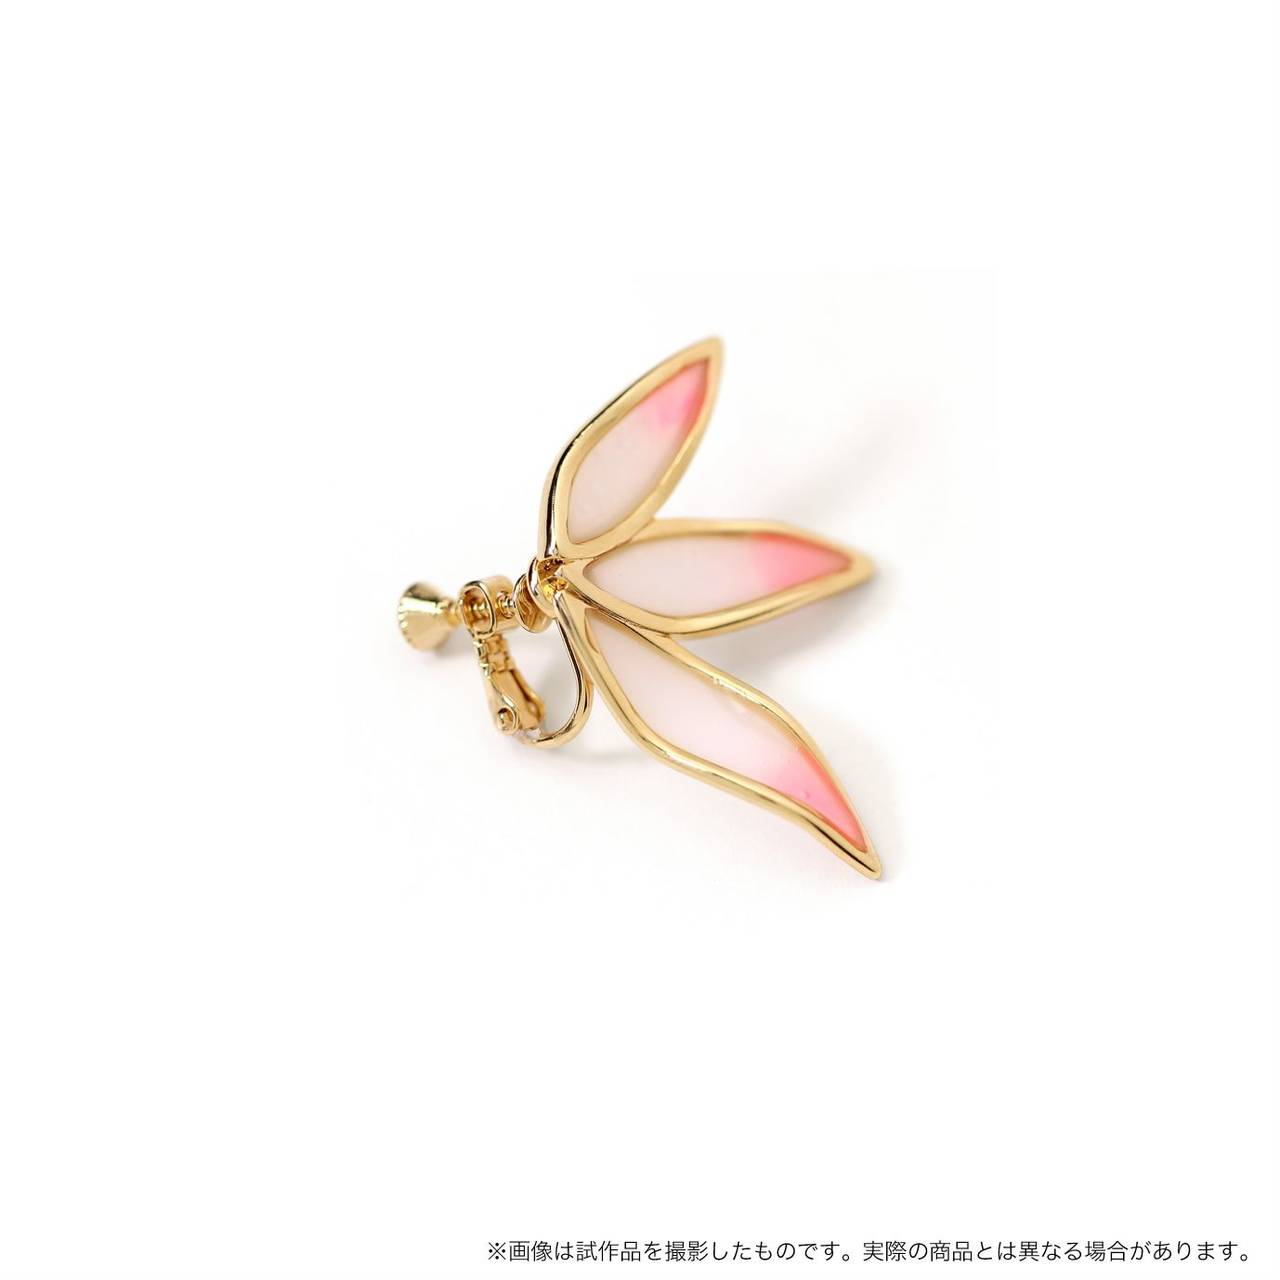 『Fate/Grand Order -絶対魔獣戦線バビロニア-』マーリンのイヤリング2